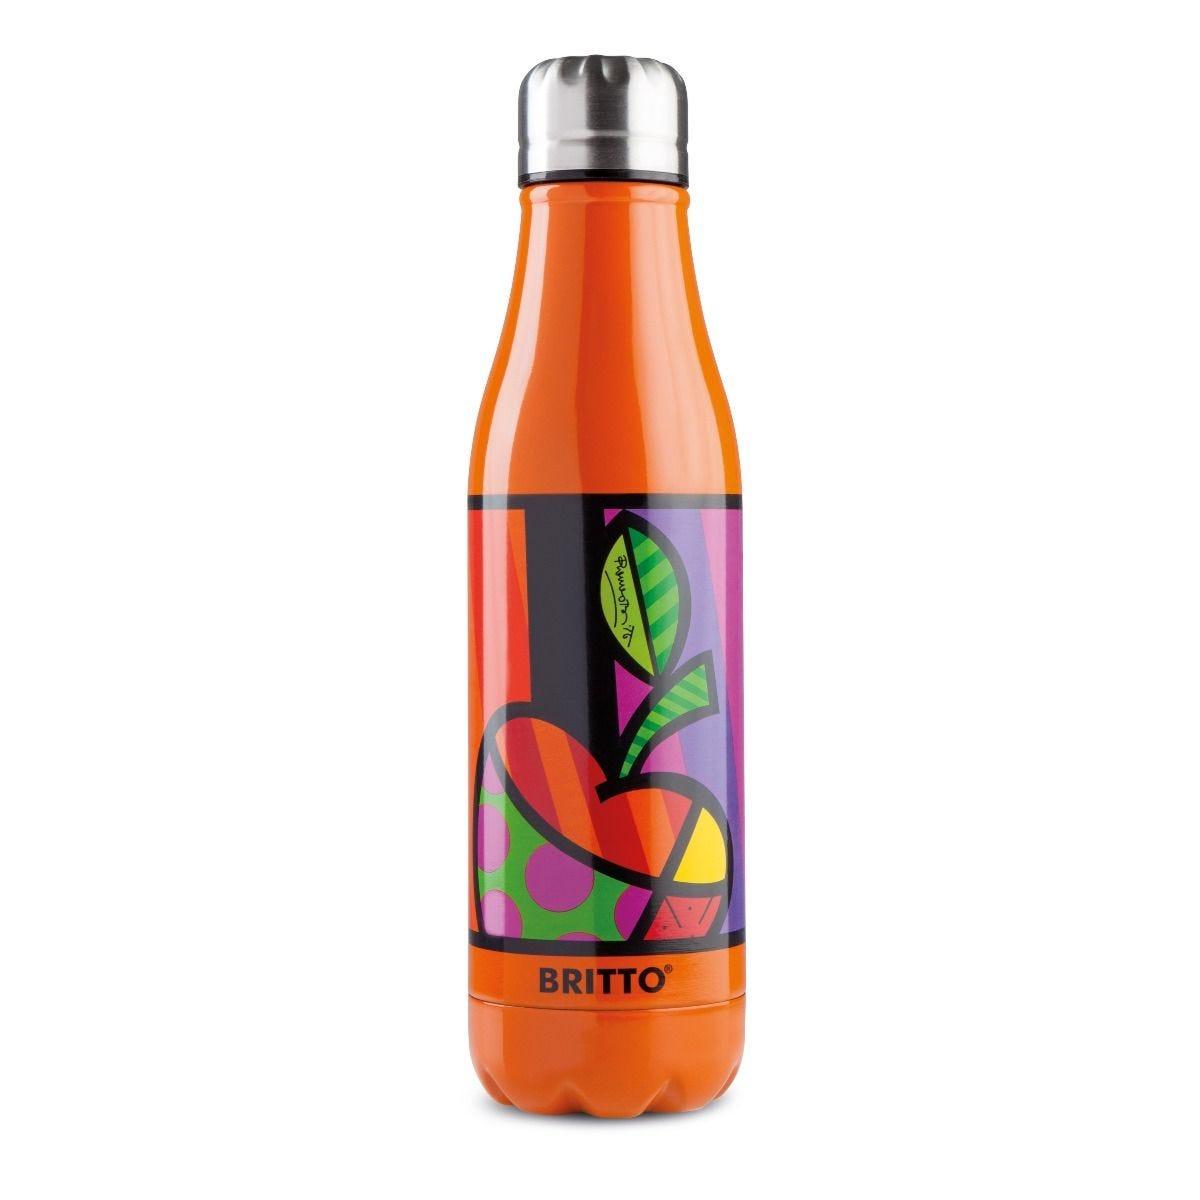 Britto Stainless Steel Orange & Pop Art Apple Insulated Flask Bottle - 500ml